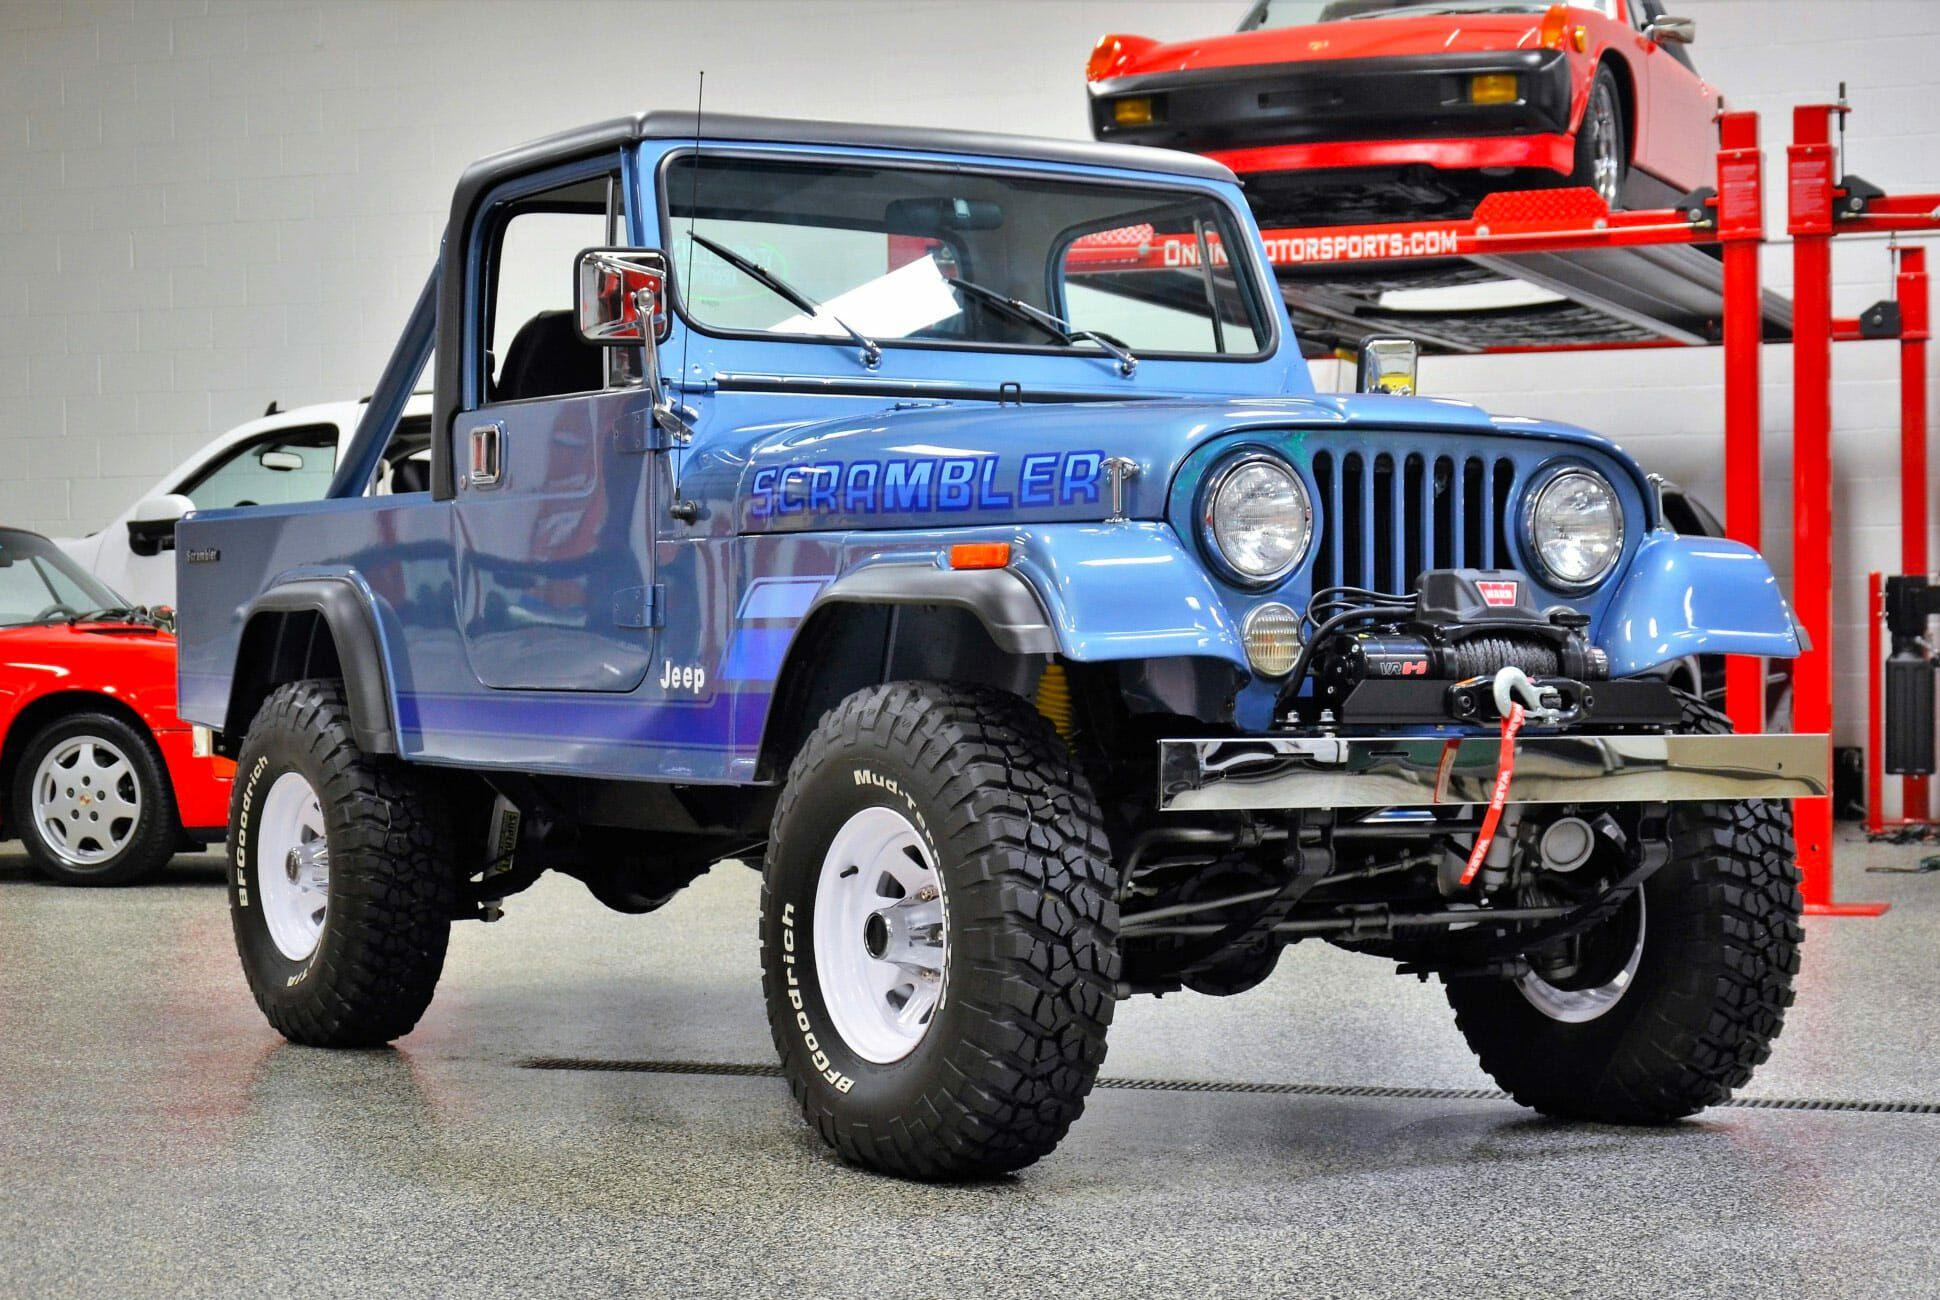 1984-Jeep-CJ8-Scrambler-gear-patrol-slide-1